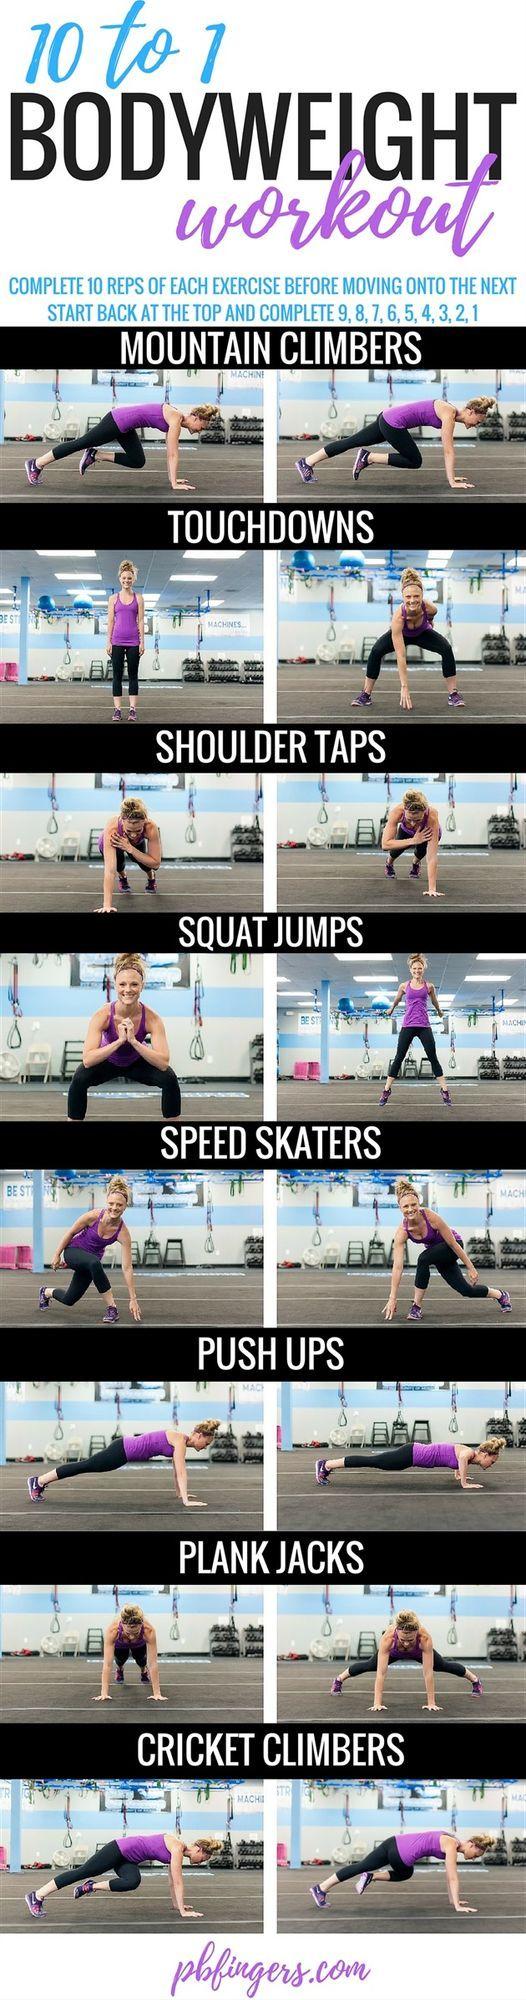 10 to 1 Bodyweight Workout   Peanut Butter Fingers   Bloglovin'